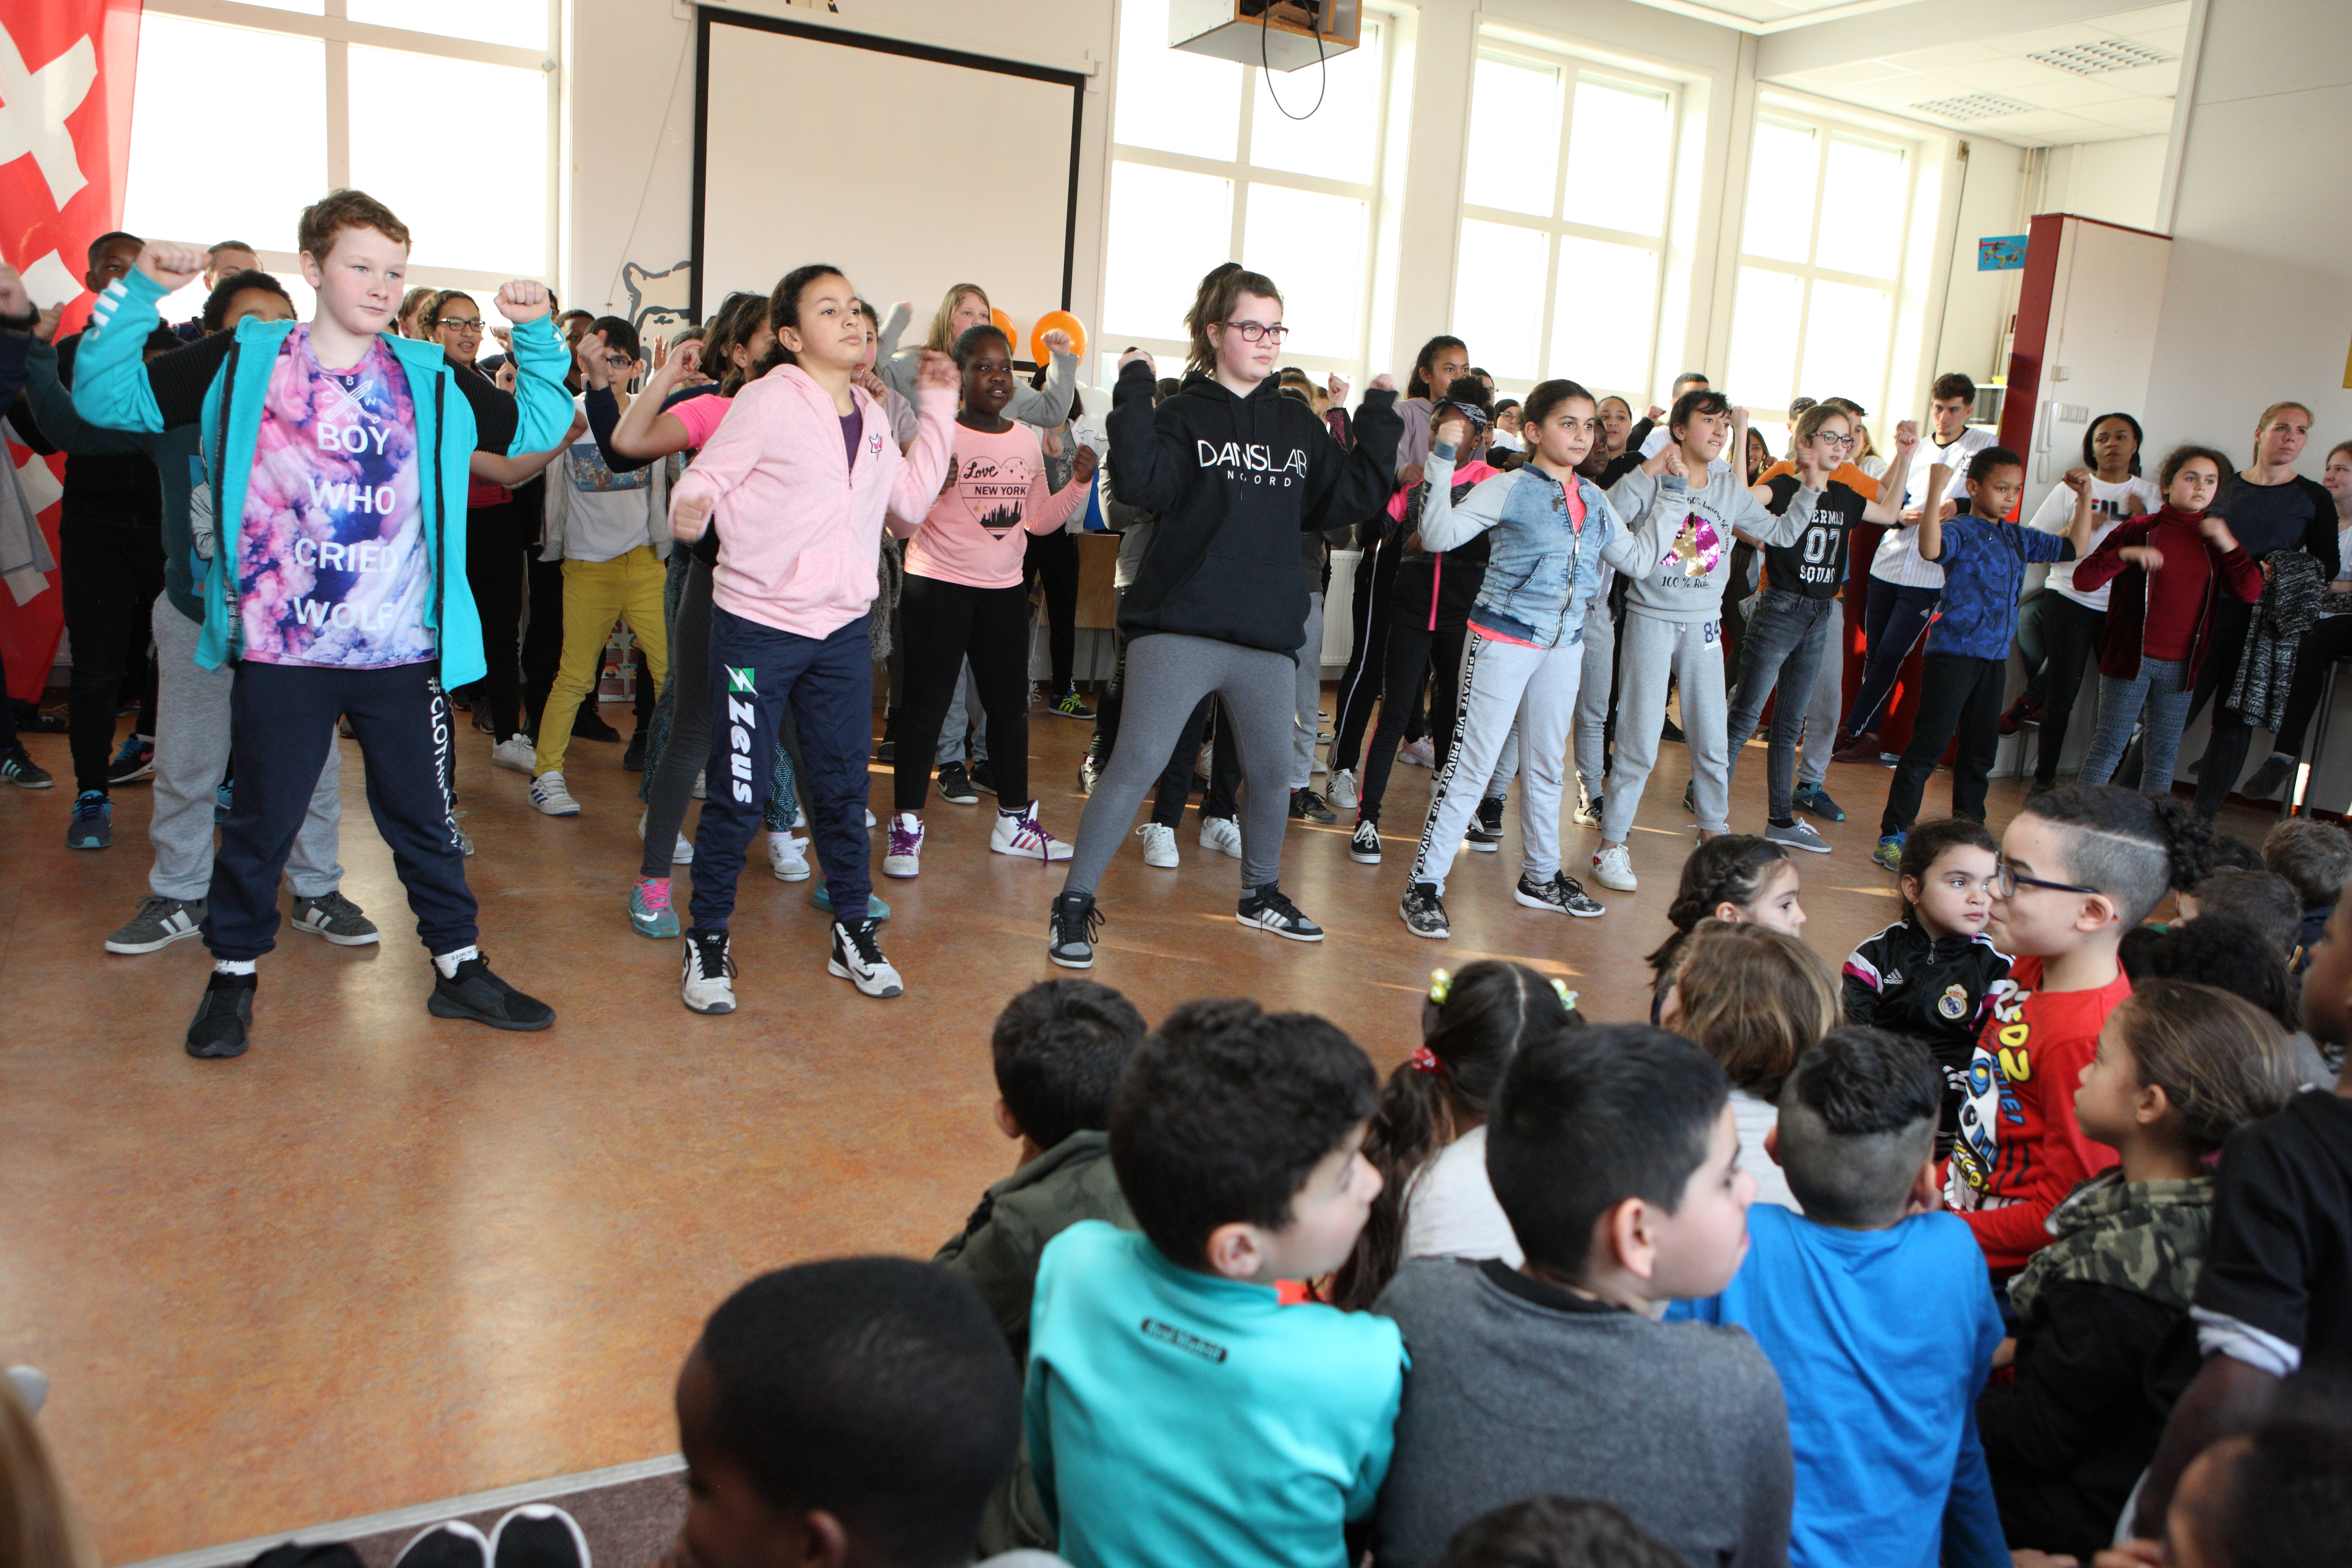 Dansvoorstelling van leerlingen voor alle ouders. (Foto: Wil van Iersel)